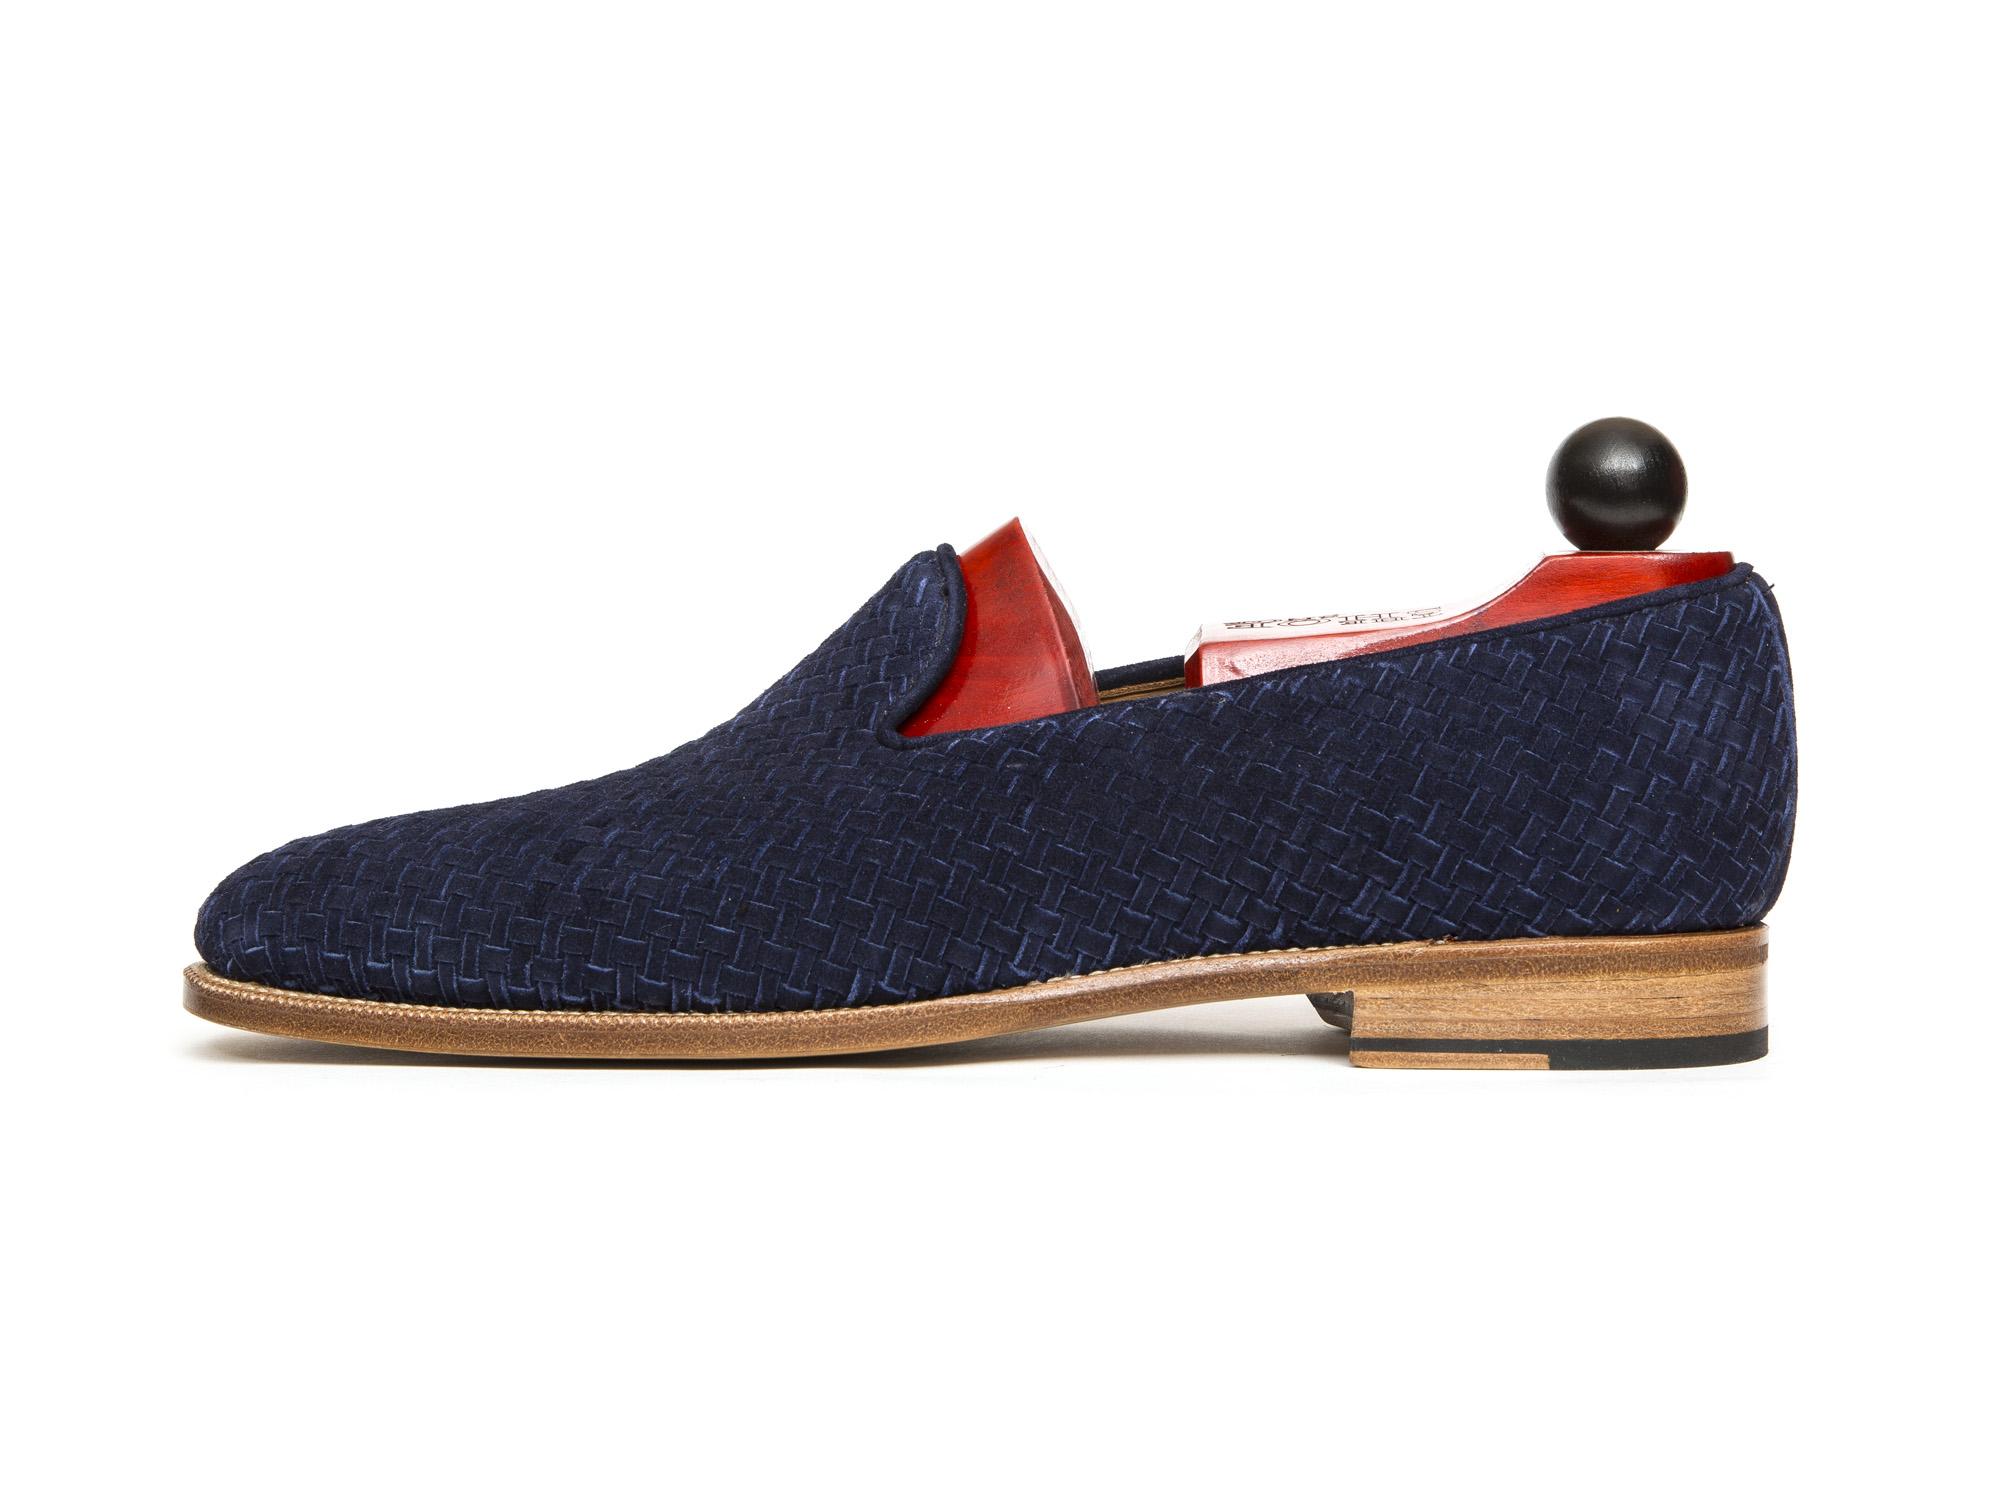 j-fitzpatrick-footwear-collection-5-october-2018-0386.jpg